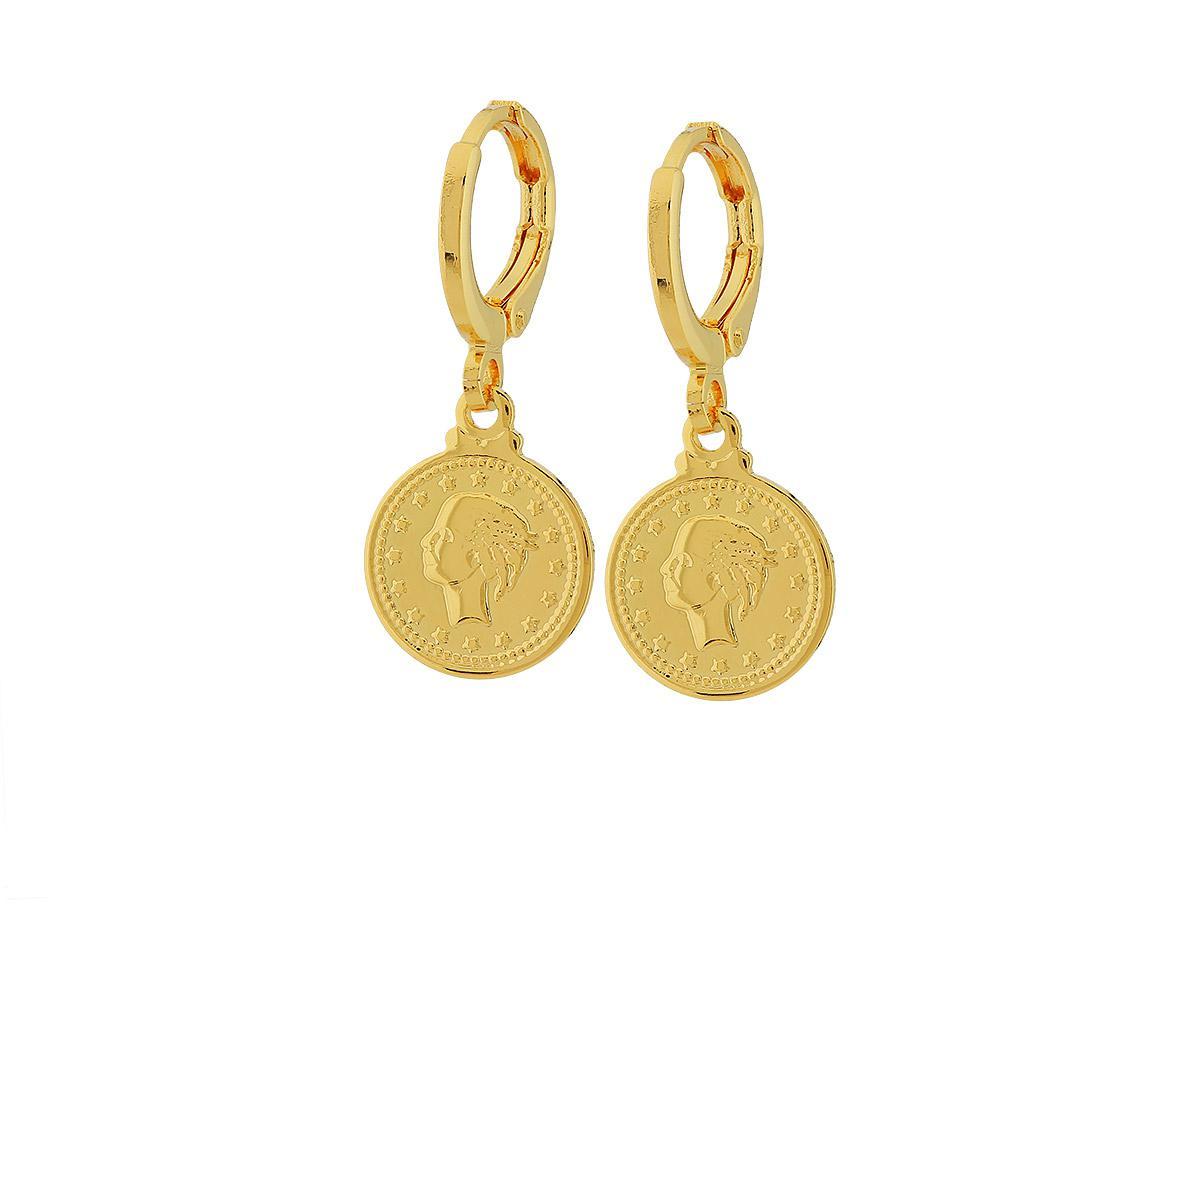 brinco argola pingente moeda libra dourado